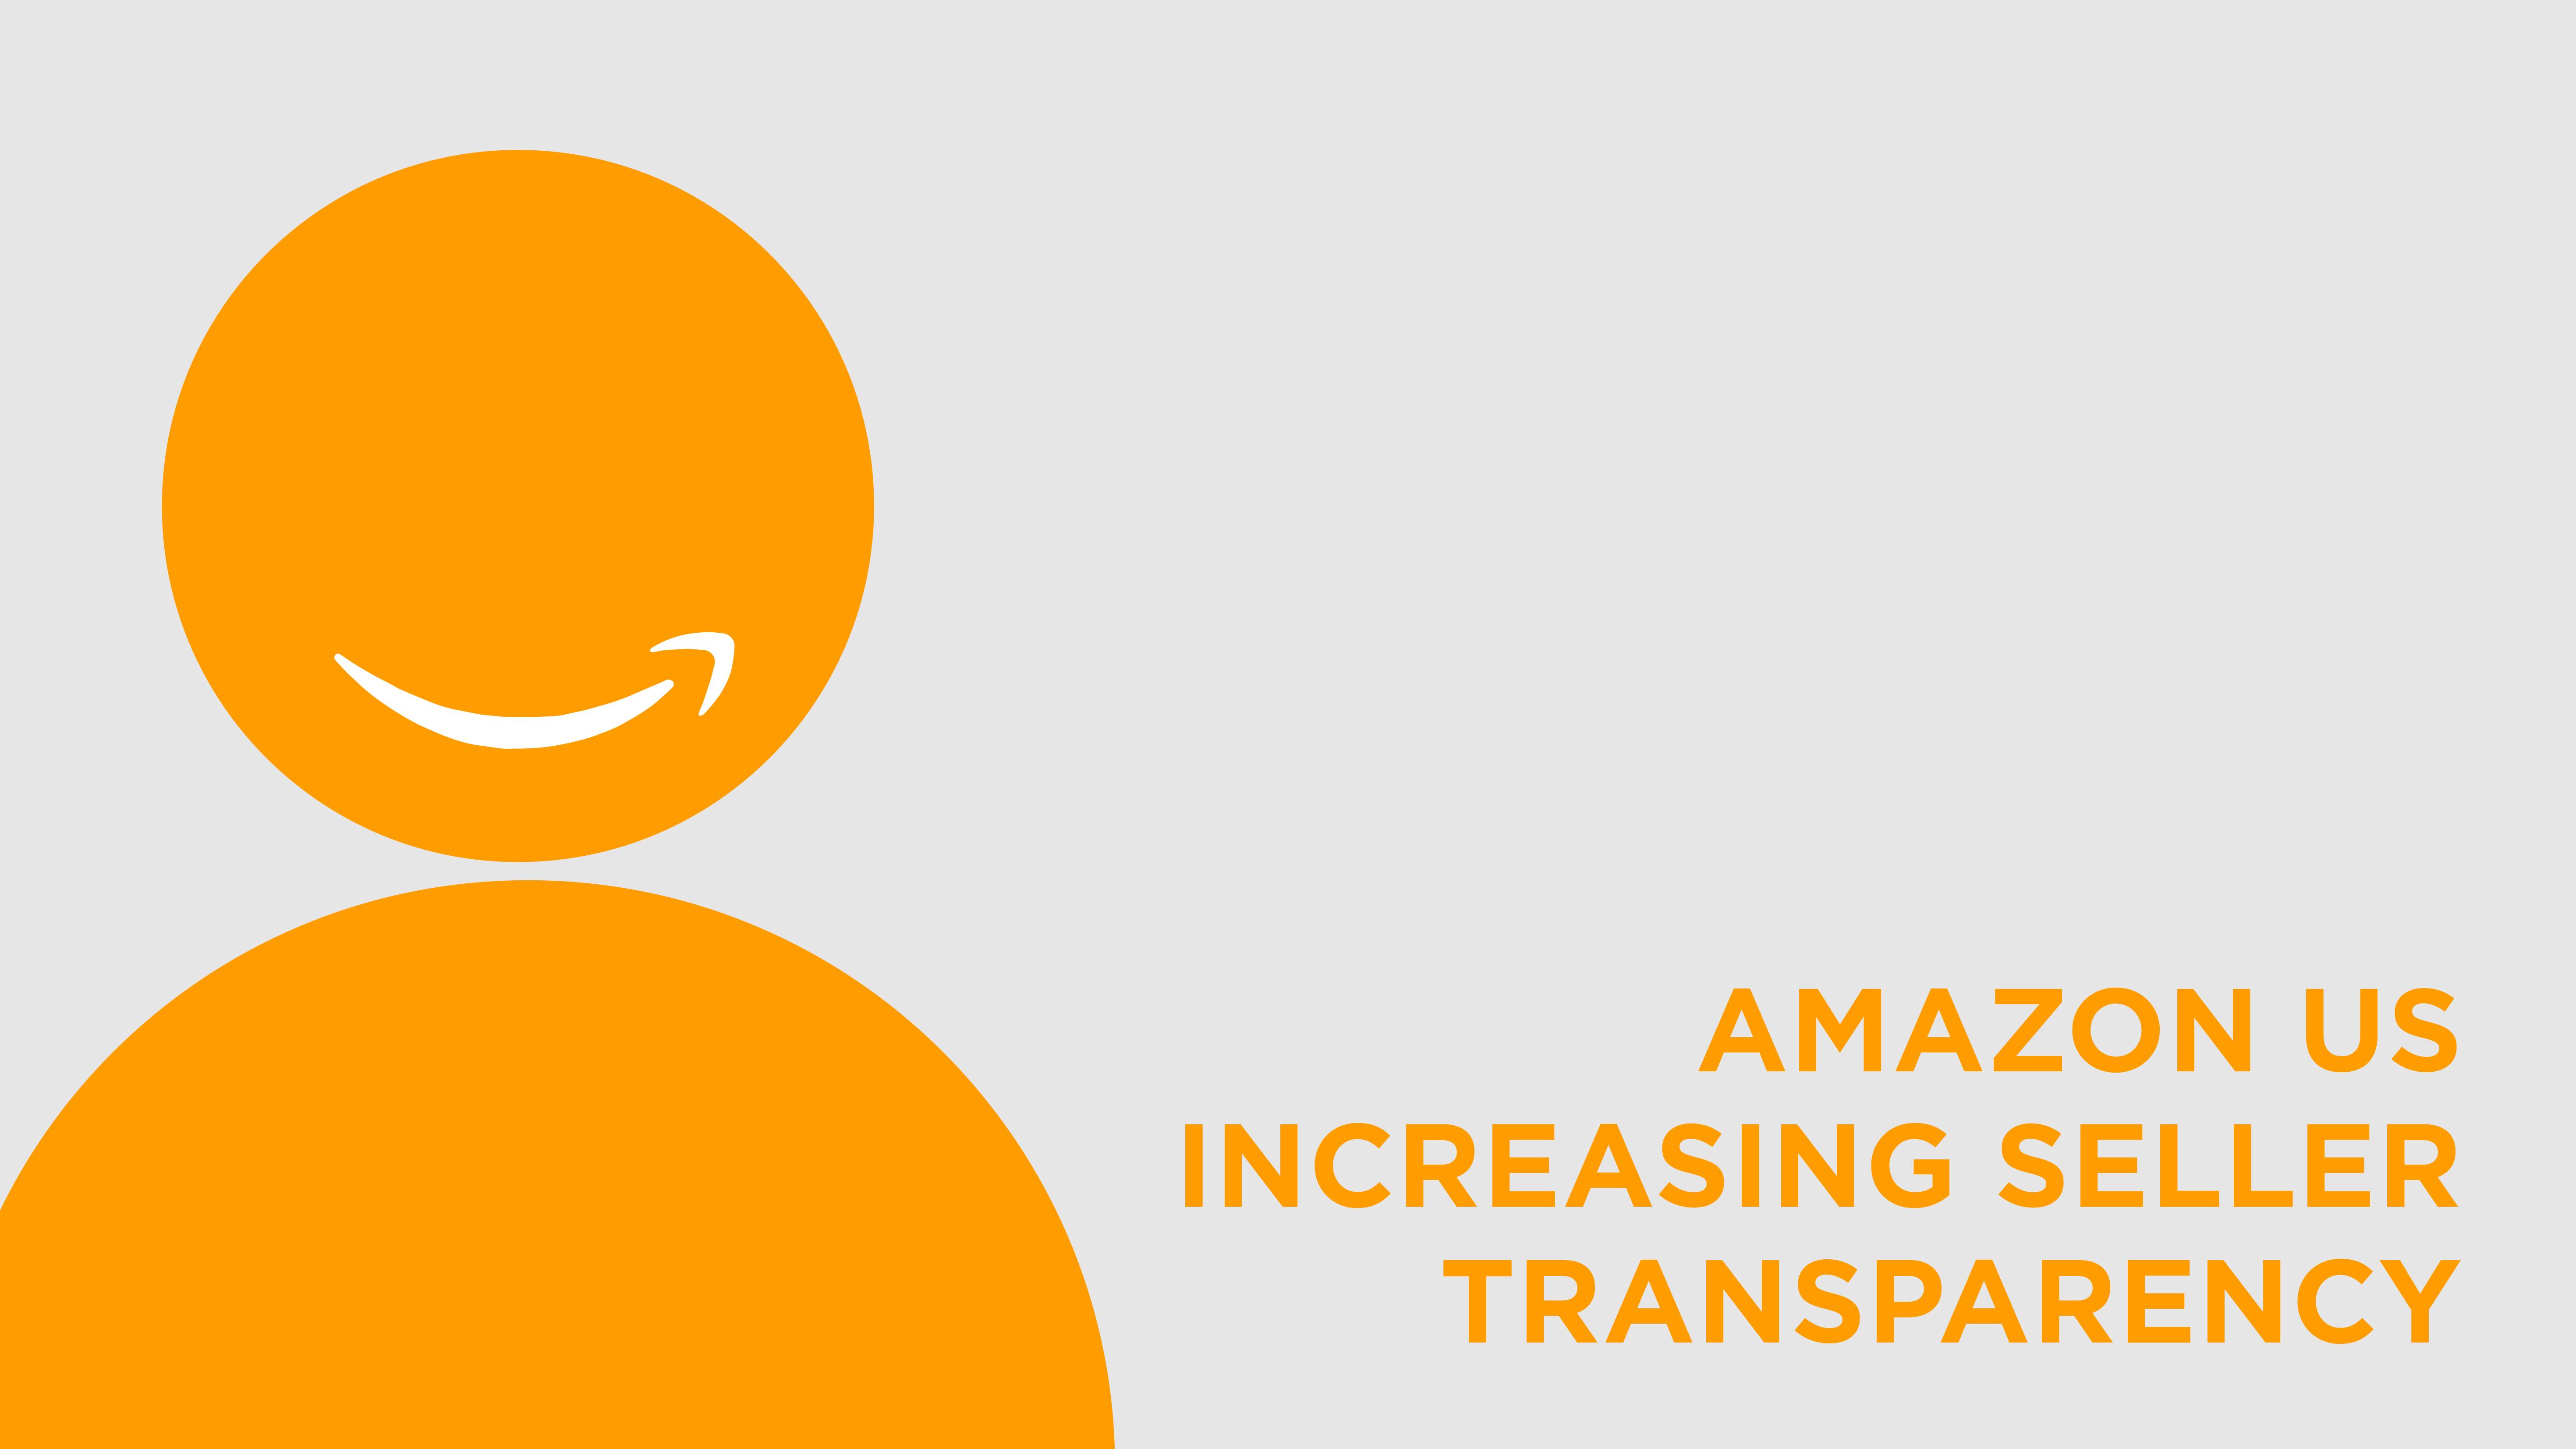 Amazon Upgrades US Seller Profiles